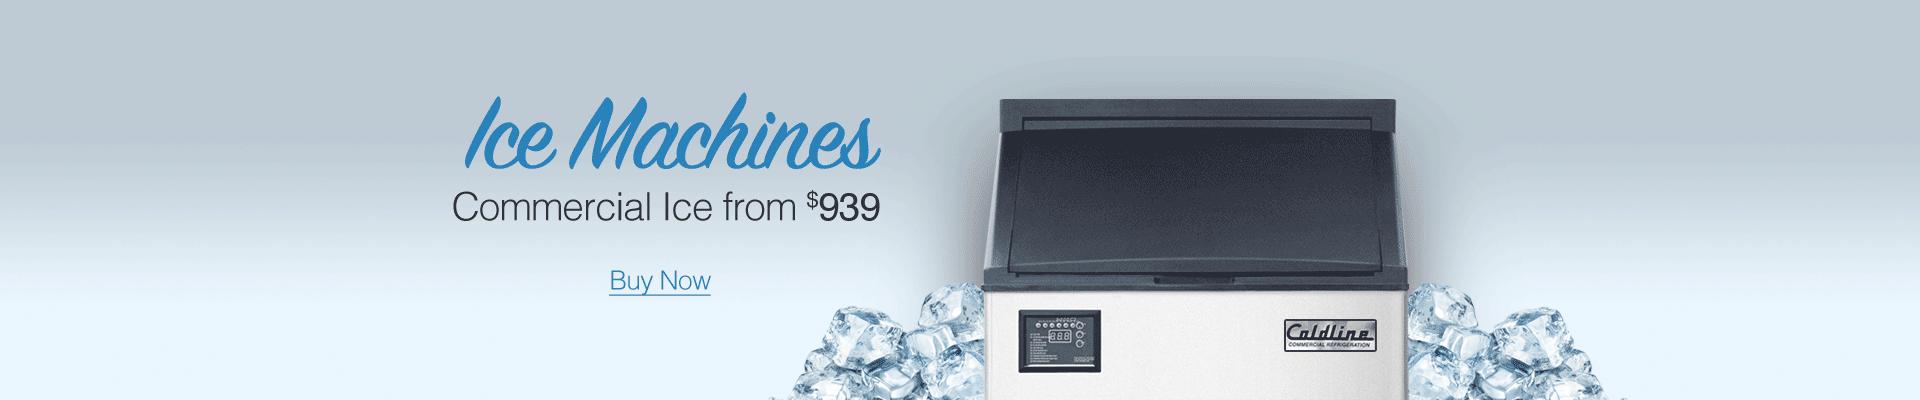 Coldline Commercial Ice Machines